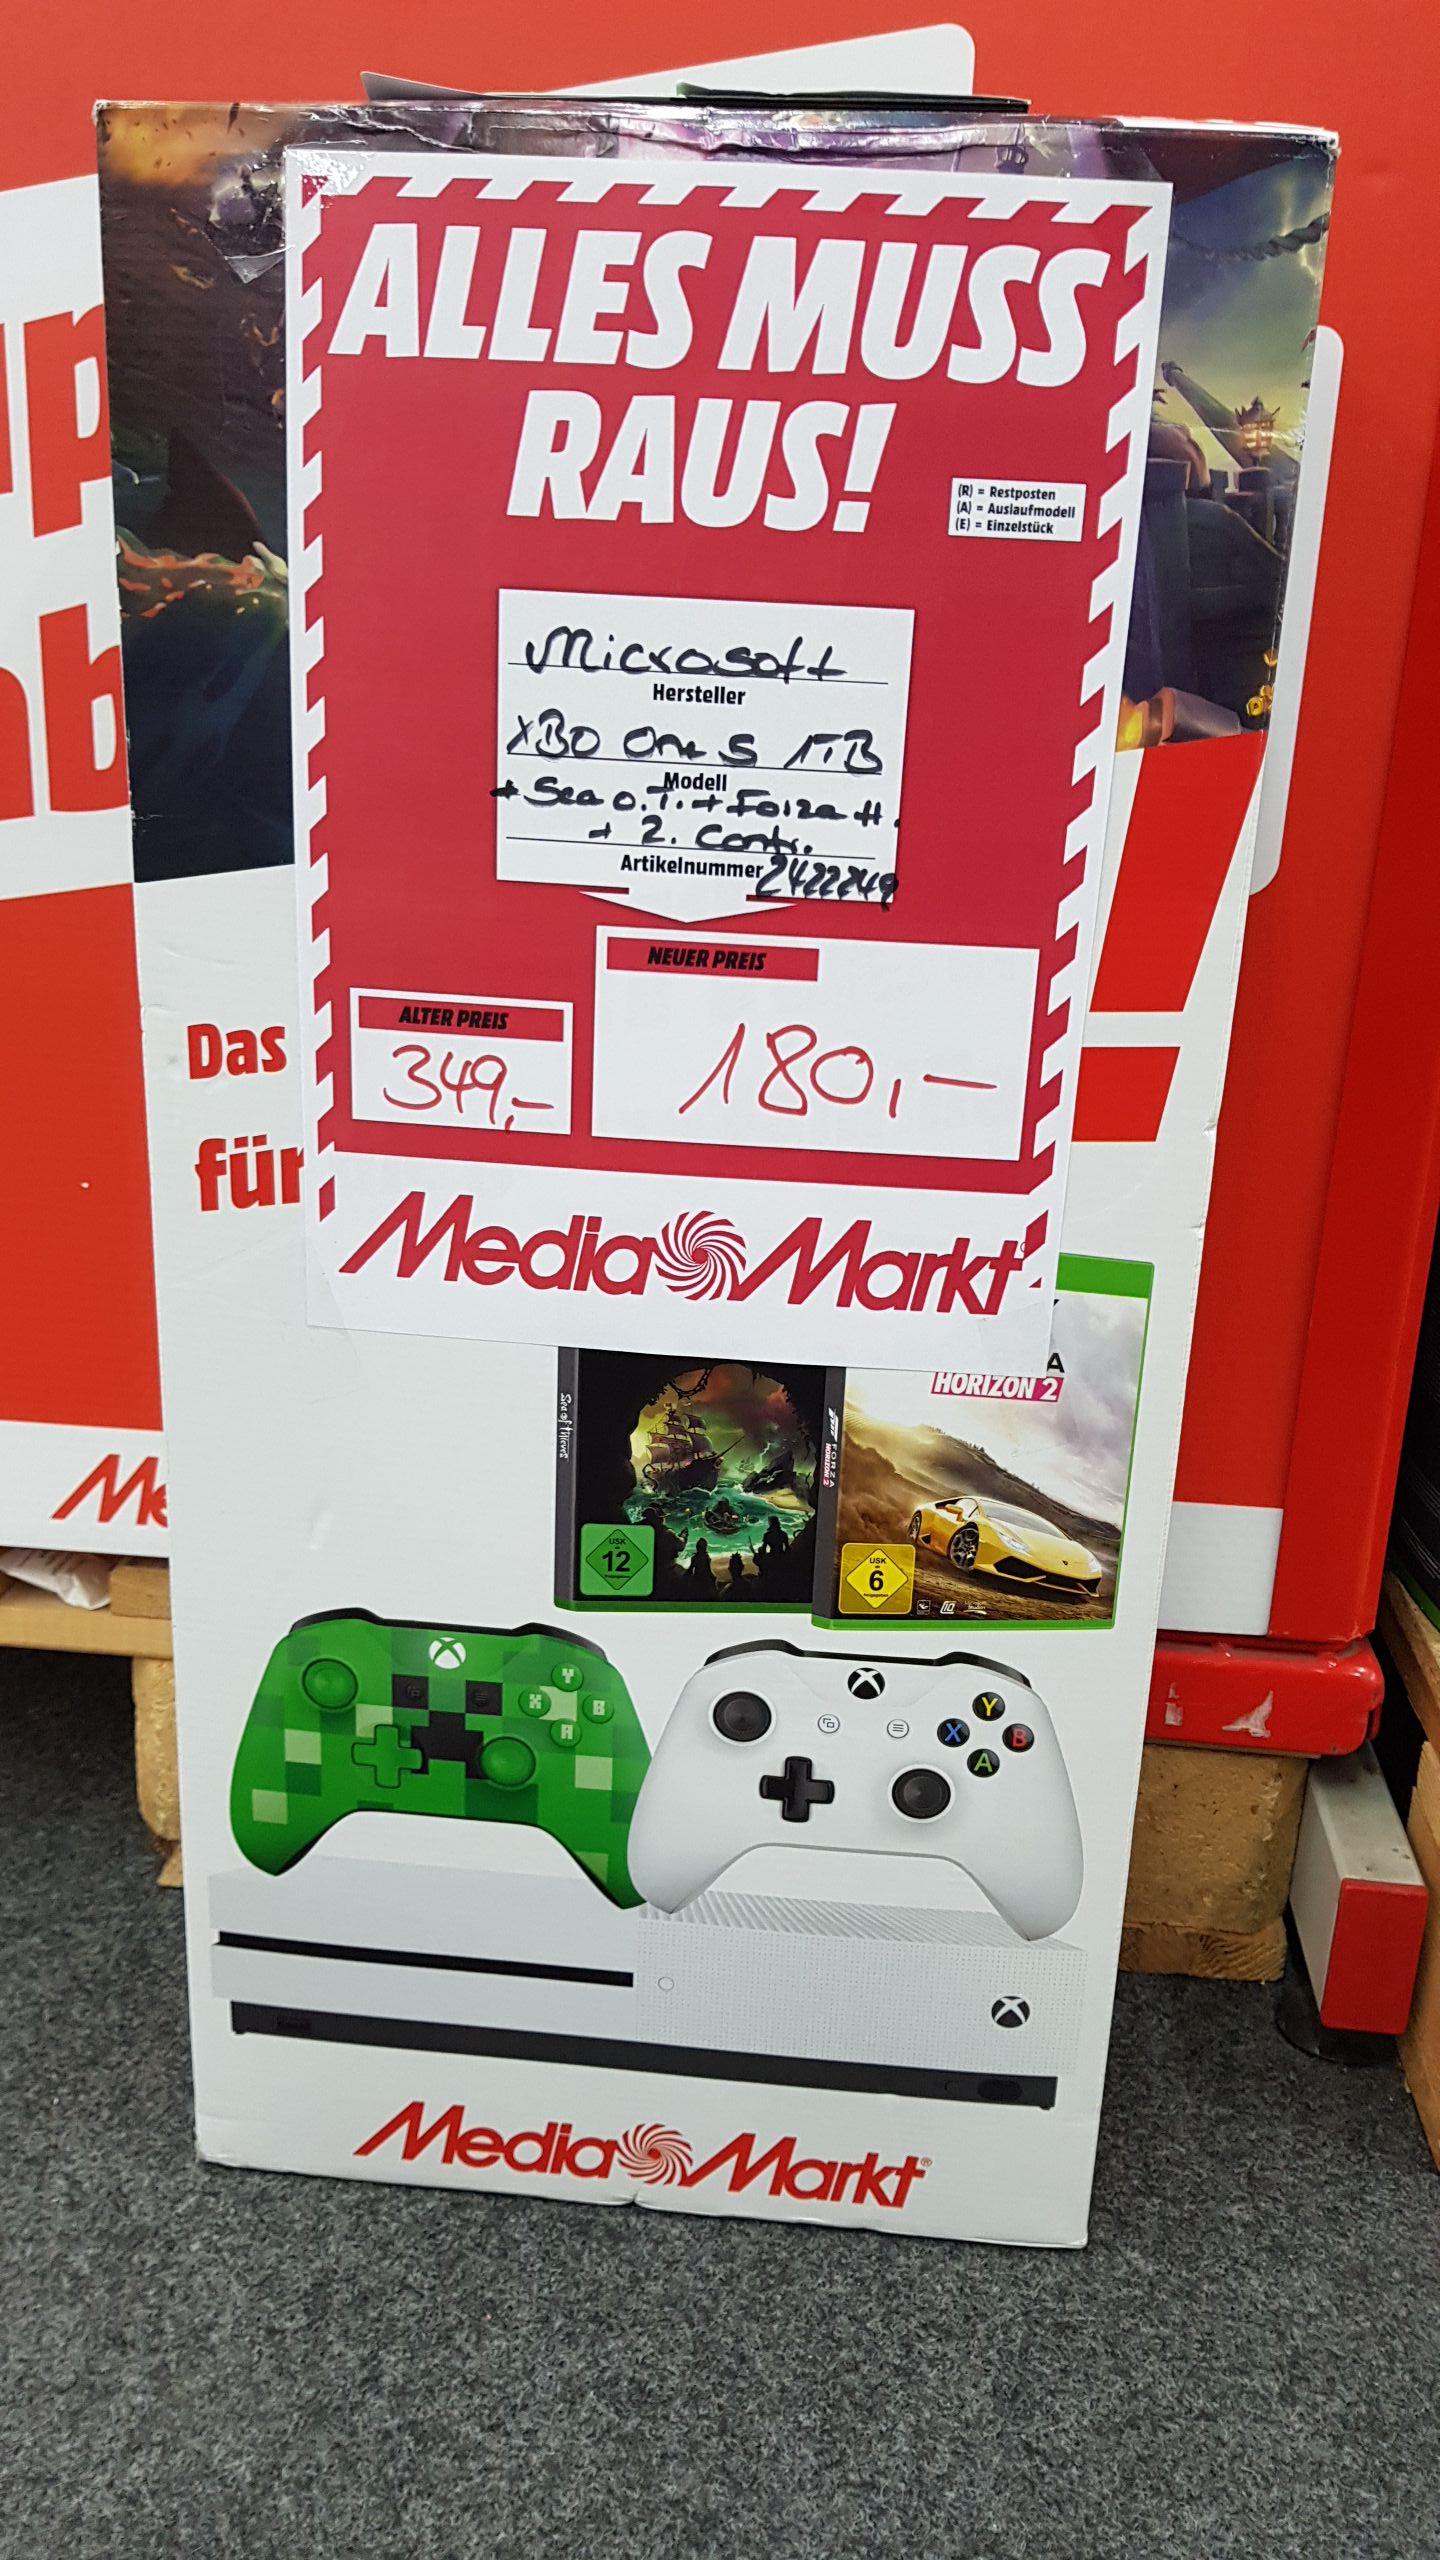 [Lokal] XBox One S Bundle 180€, XBox One X Bundle 349€ @ Mediamarkt Waiblingen